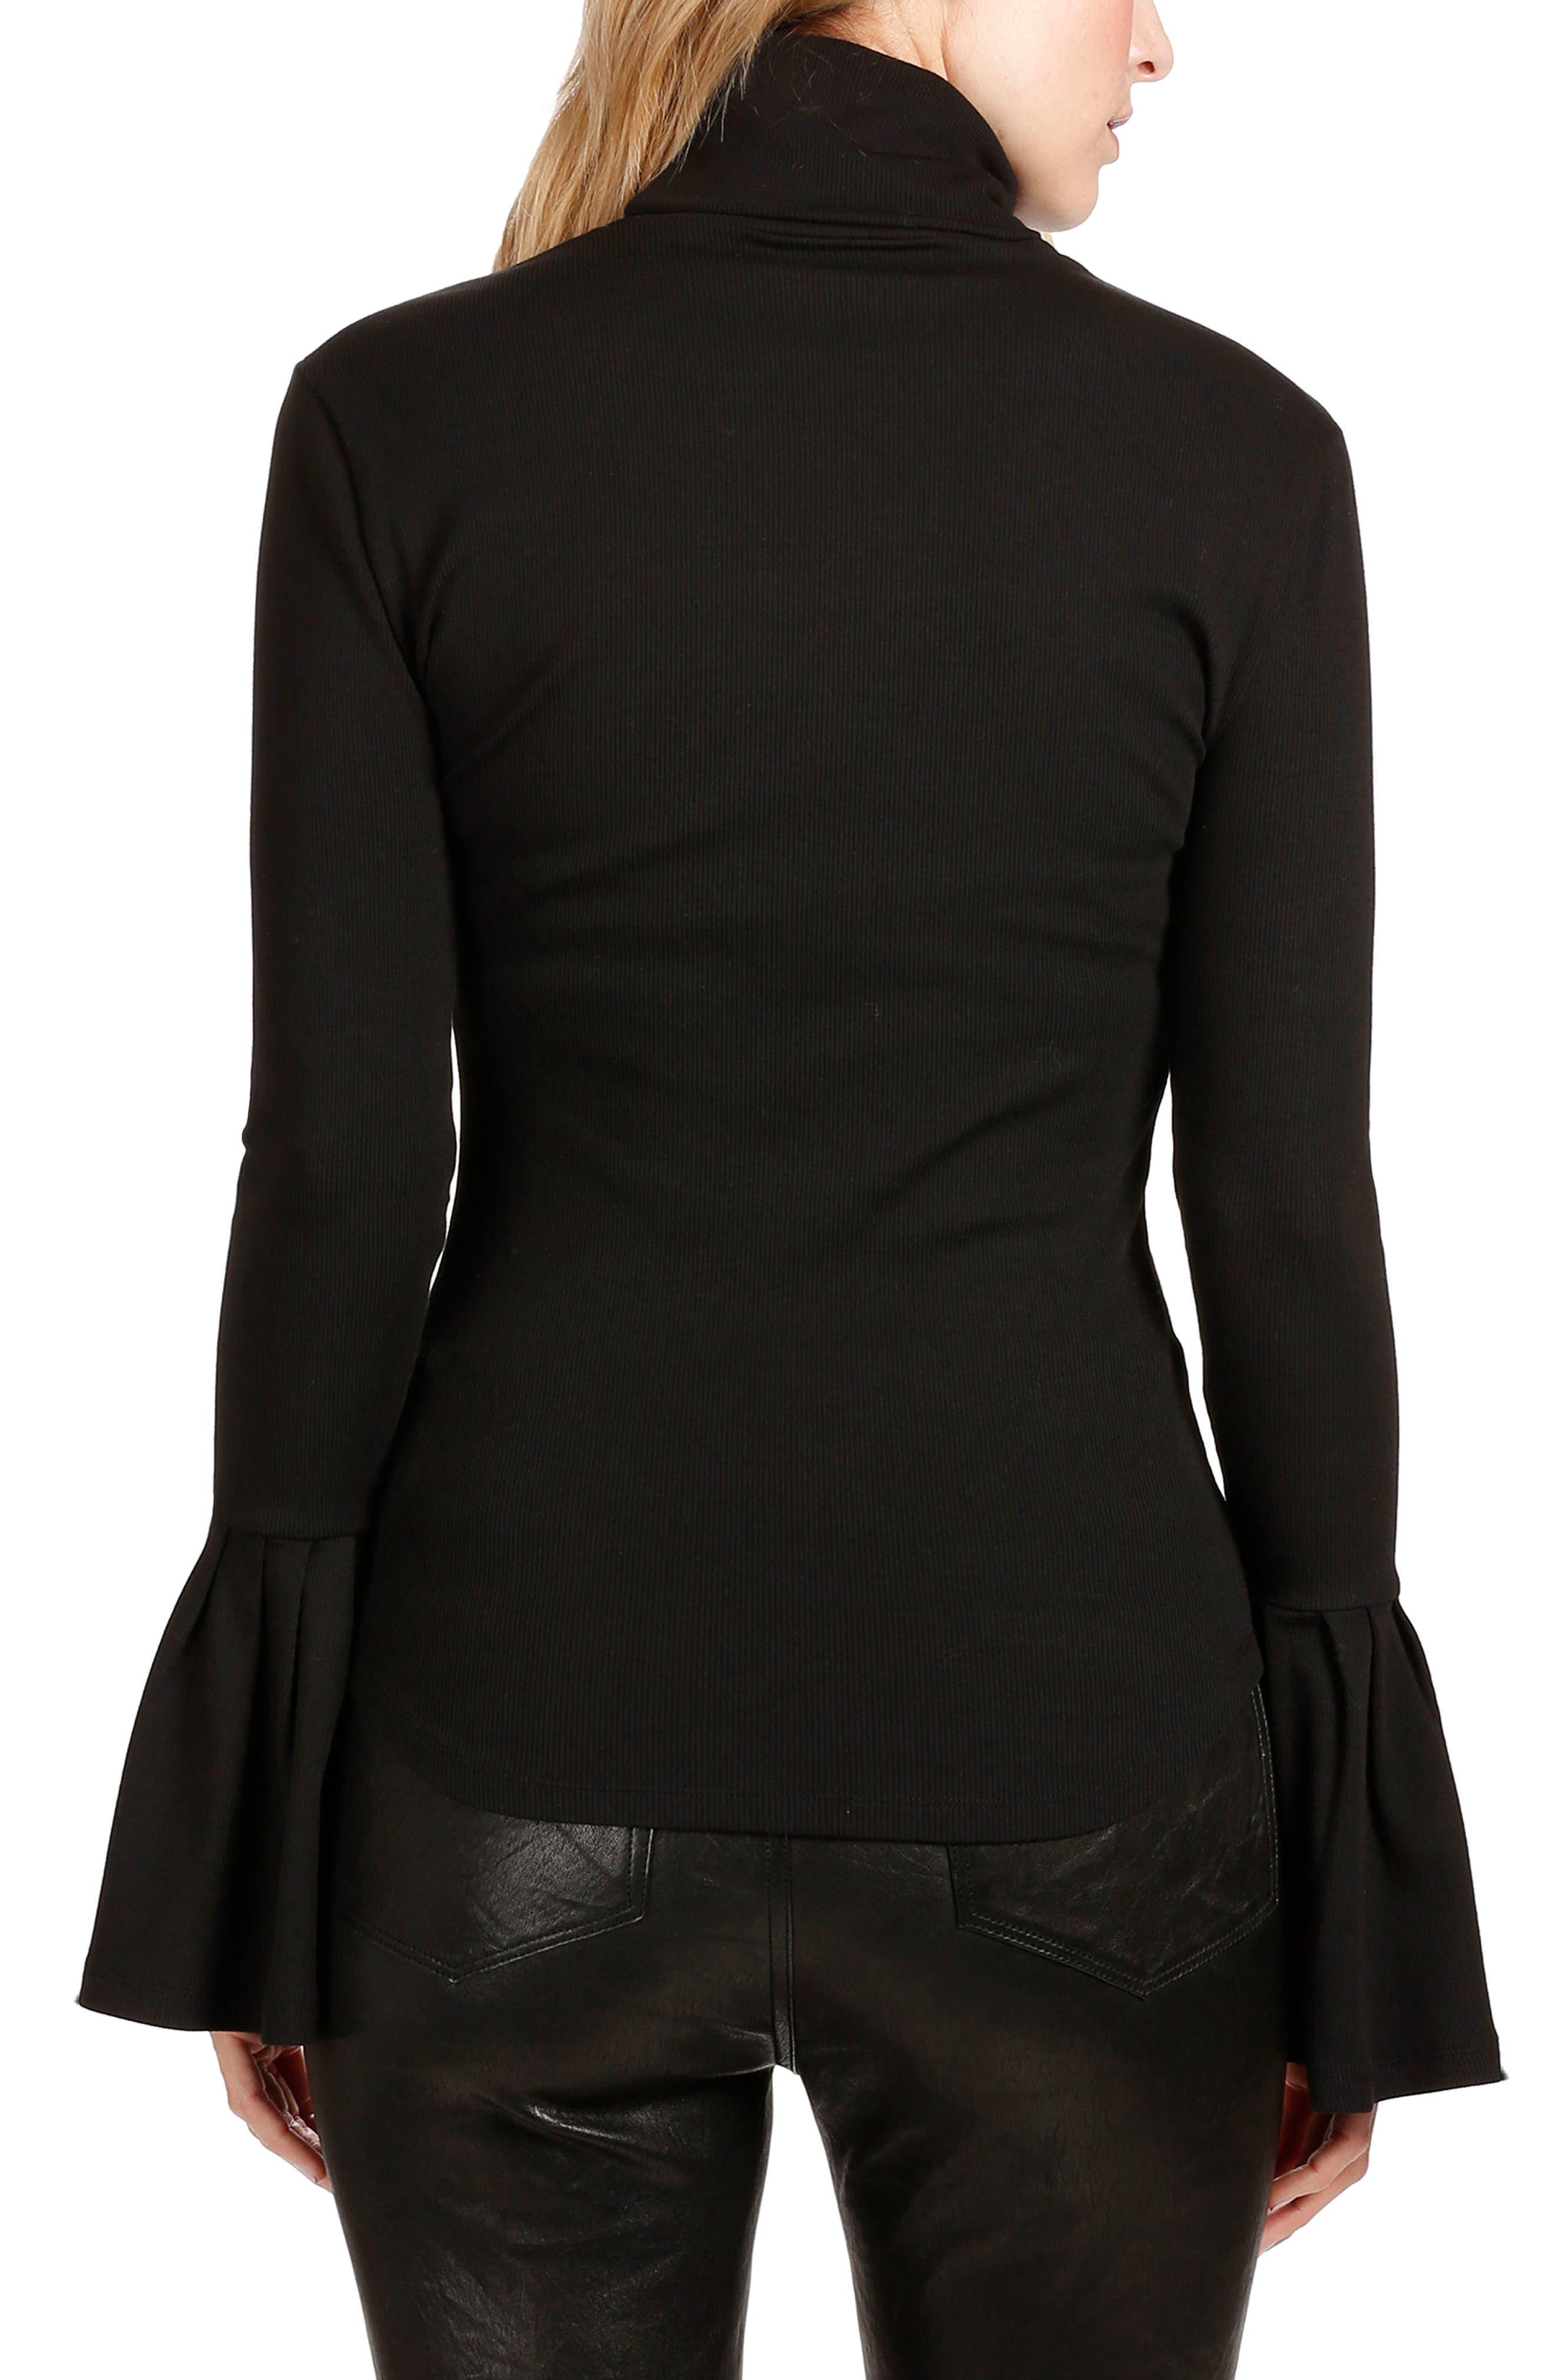 Kenzie Bell Sleeve Turtleneck,                             Alternate thumbnail 2, color,                             BLACK